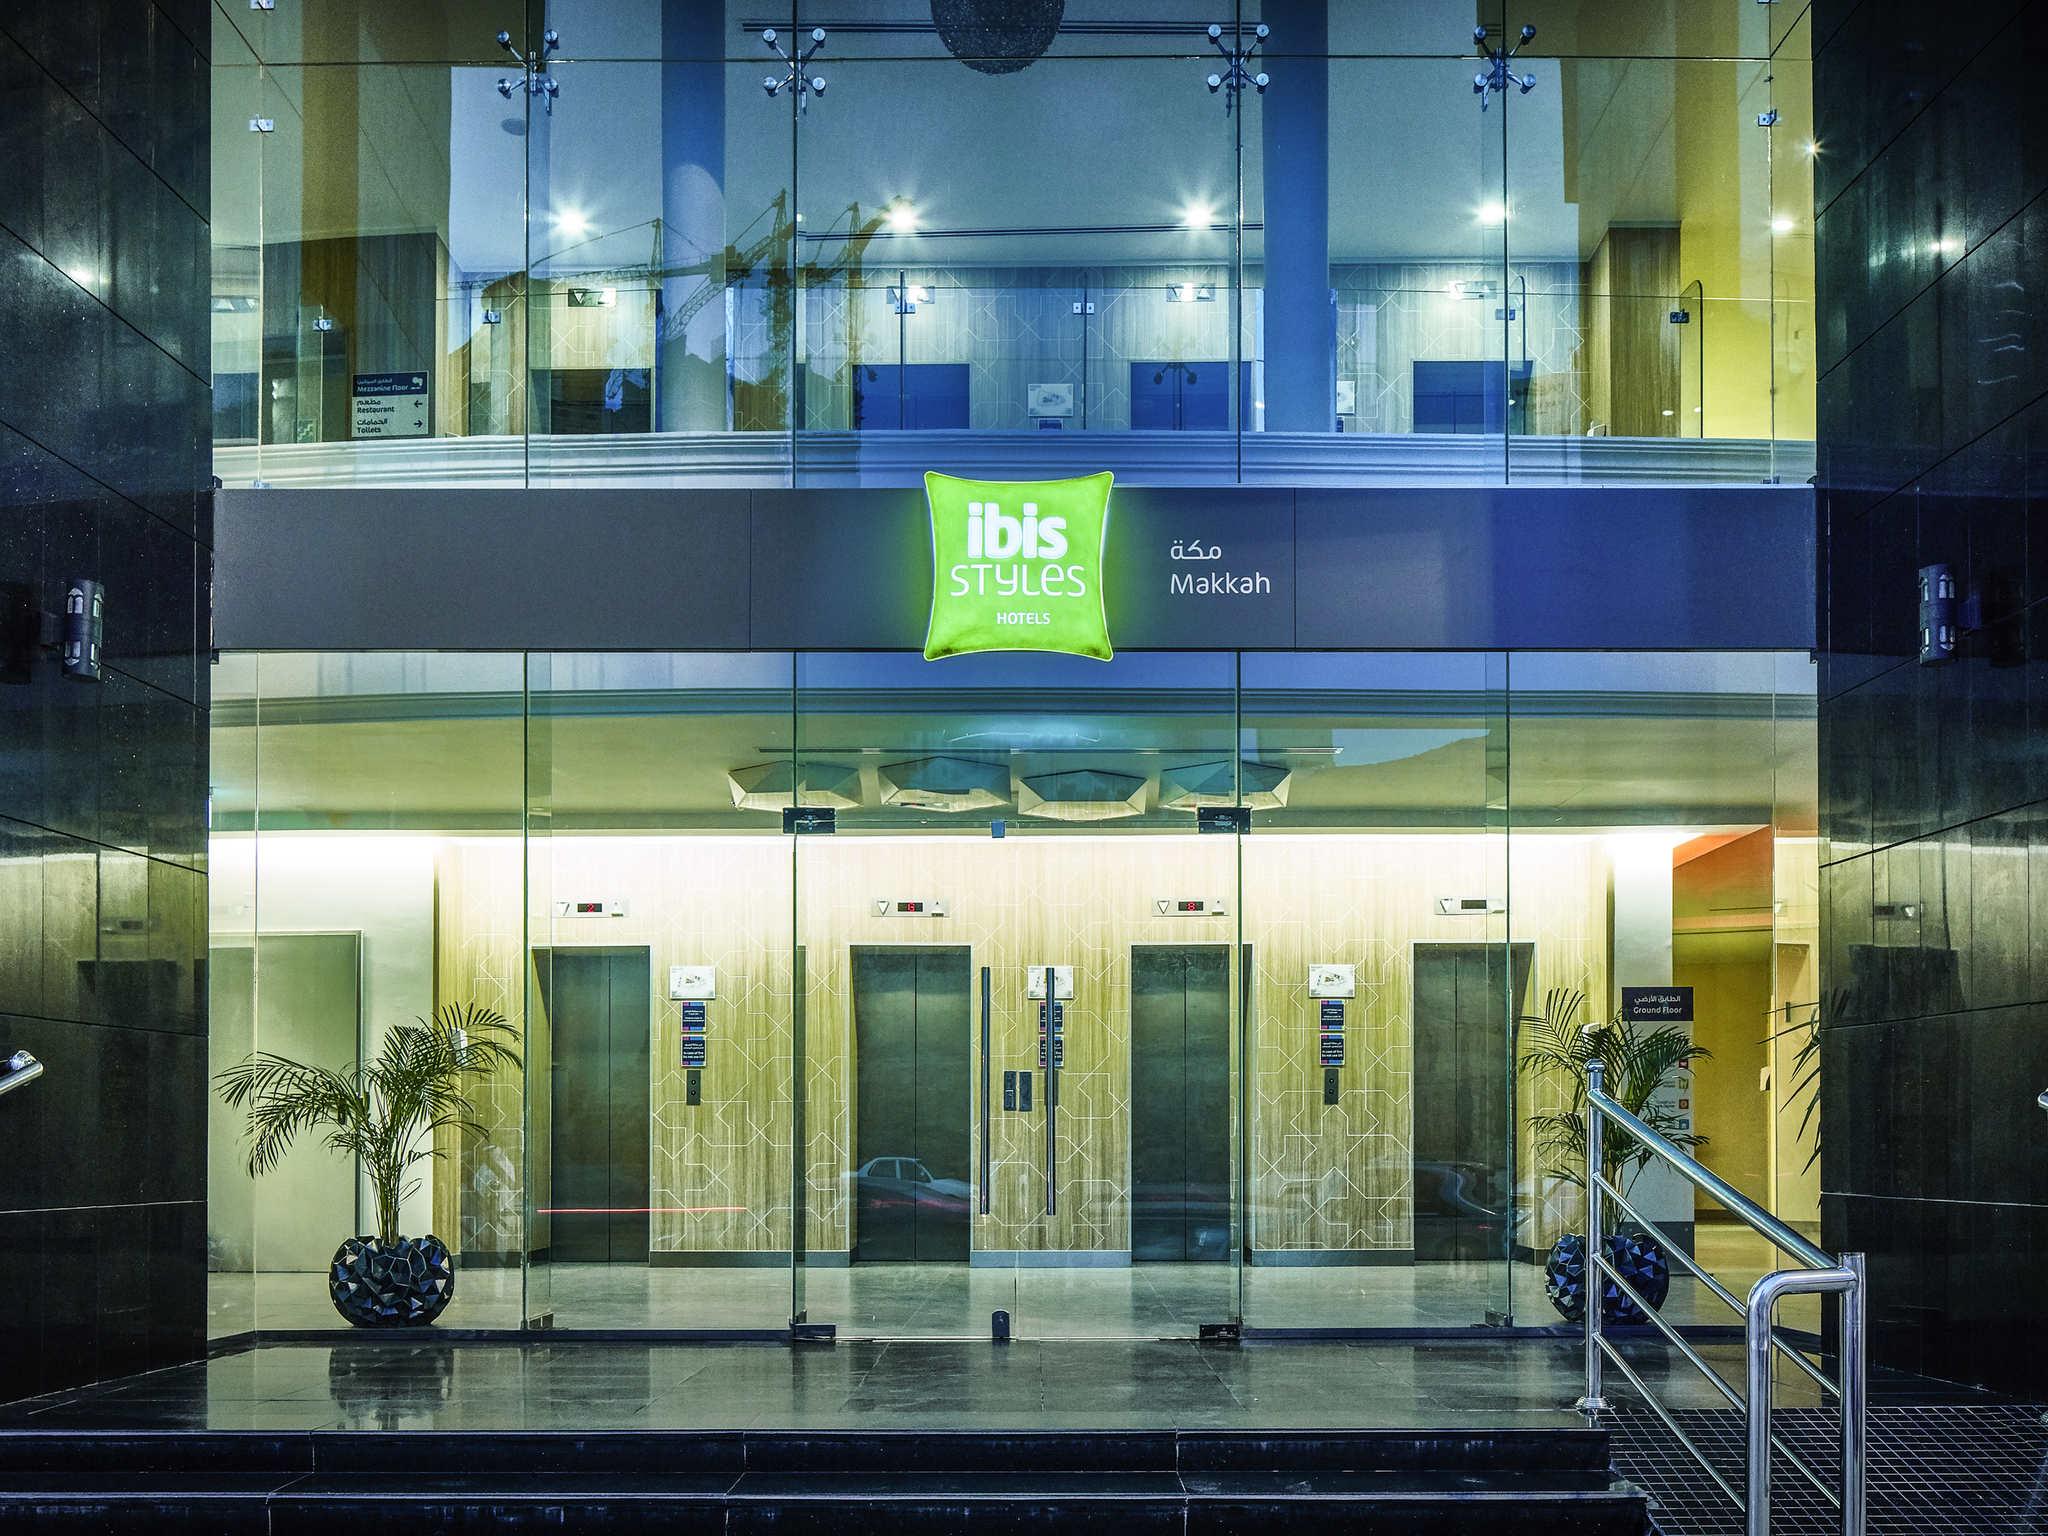 Hotel – ibis Styles Makkah